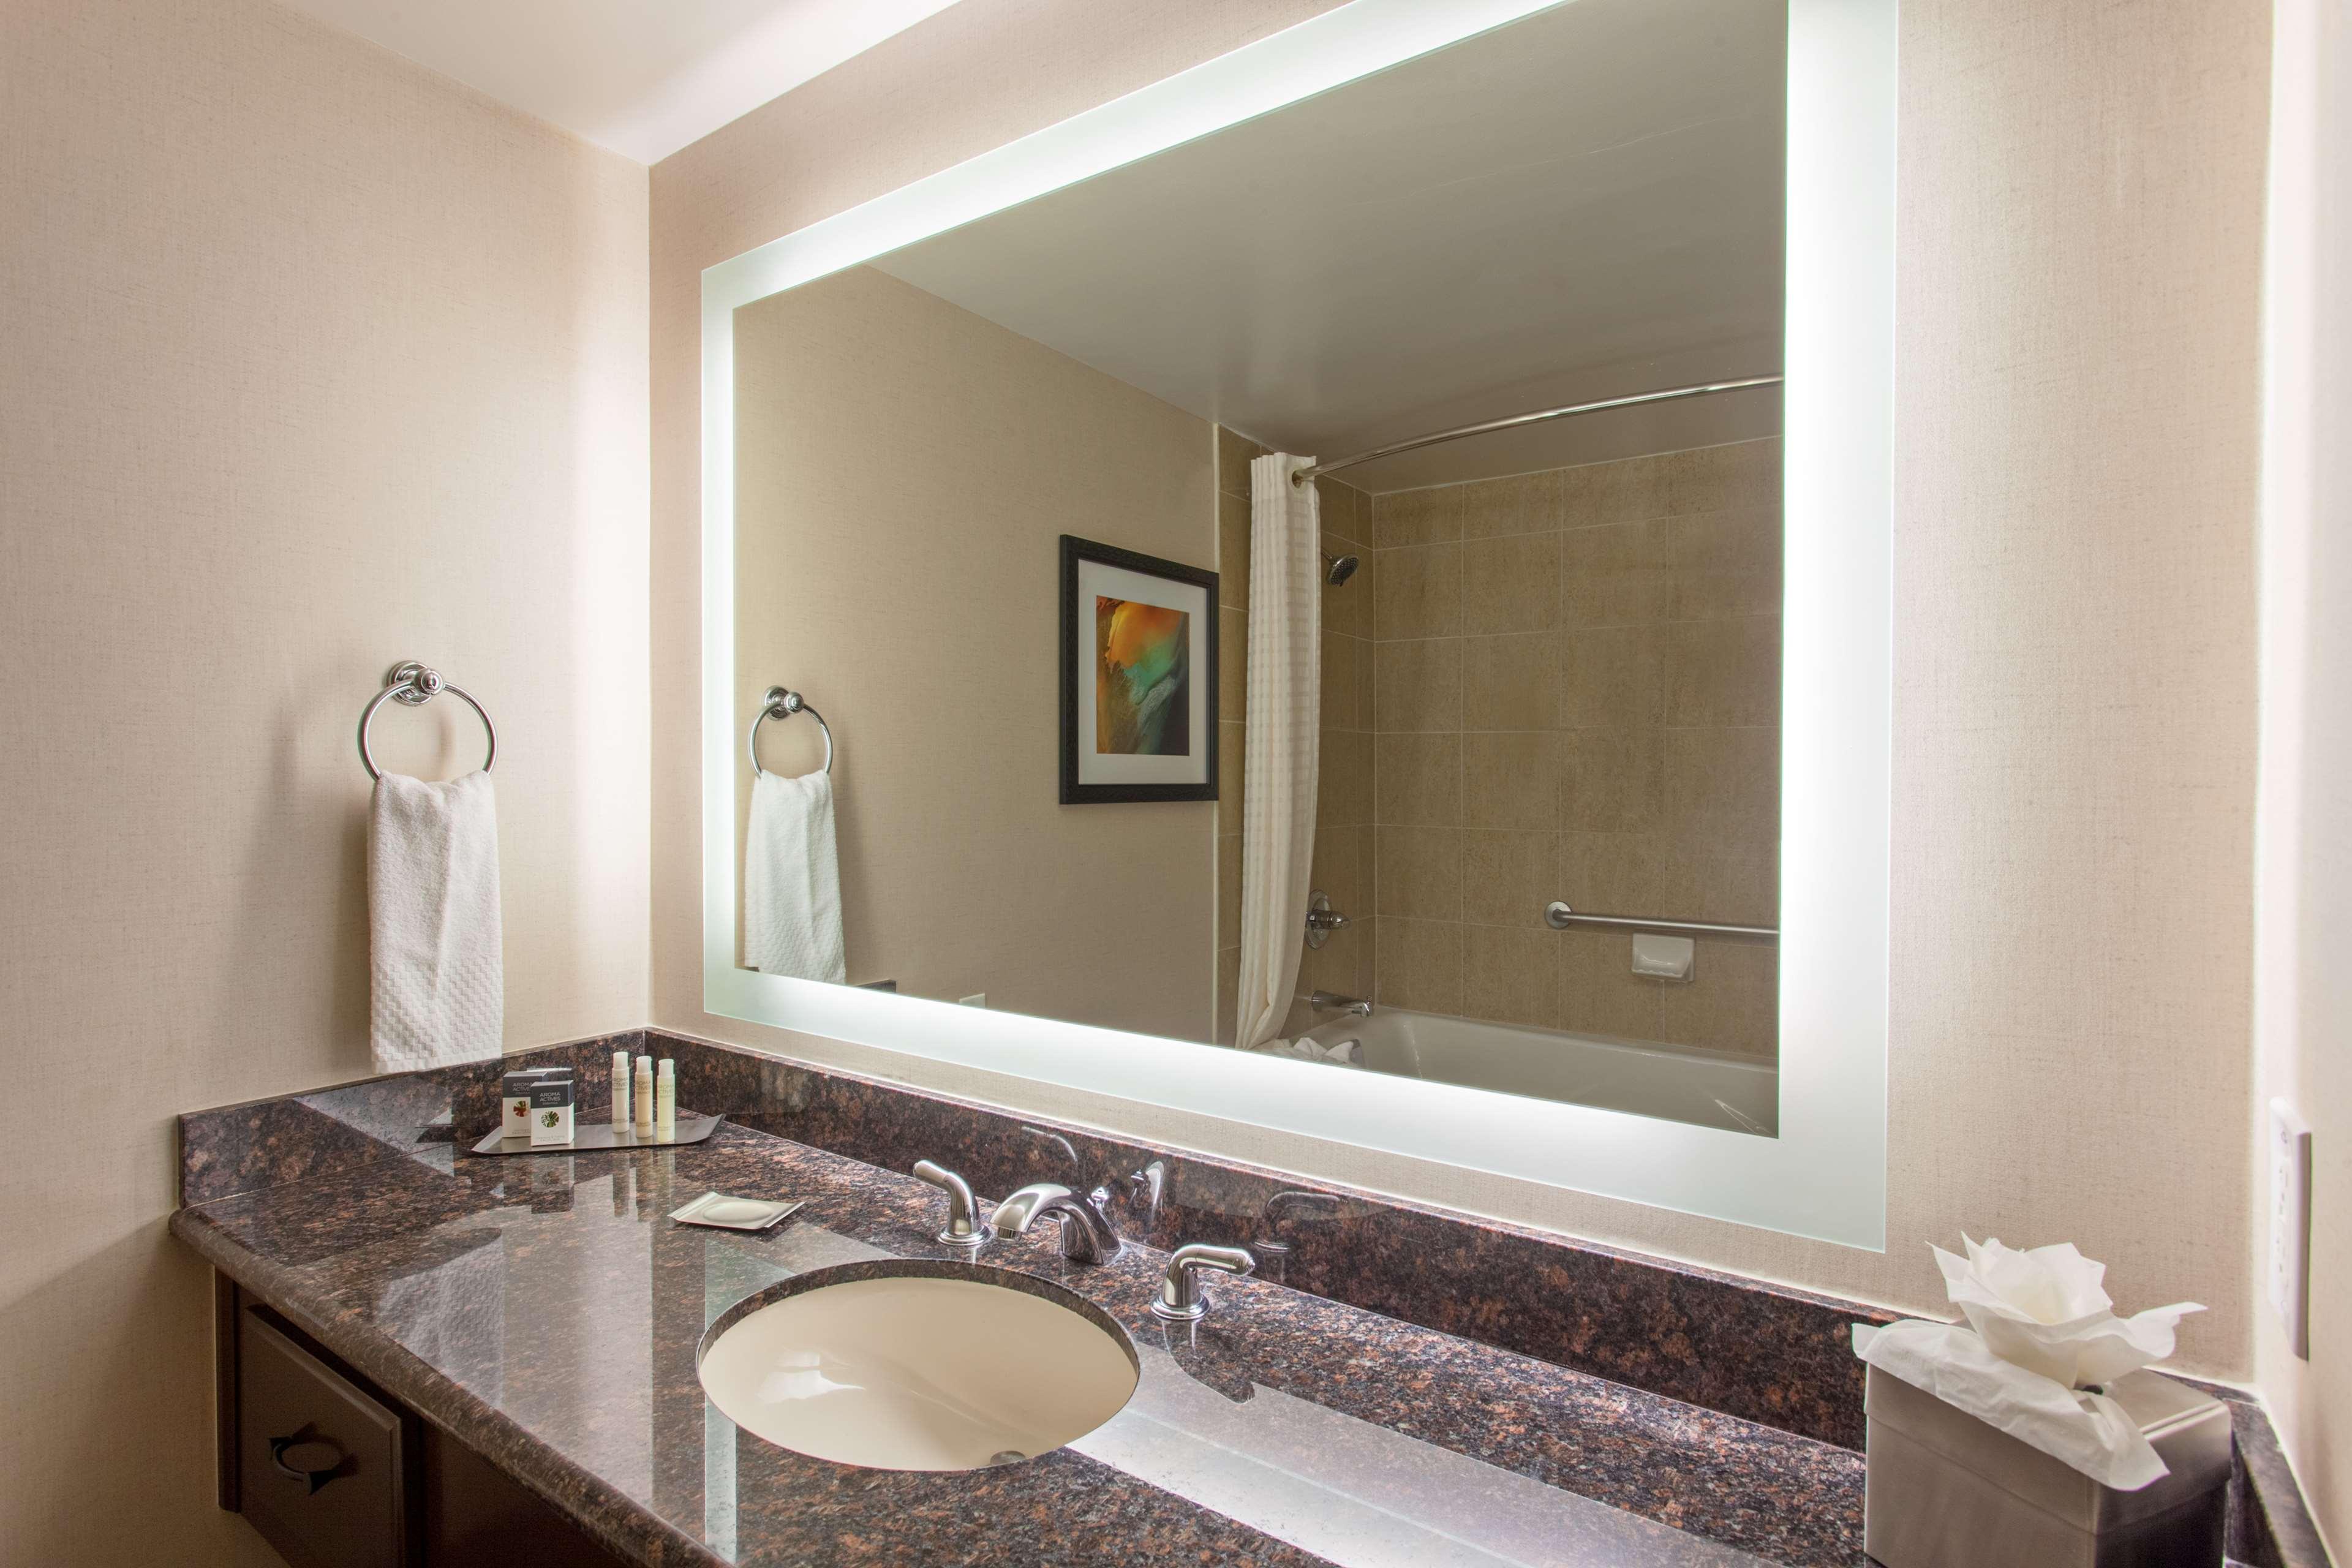 DoubleTree by Hilton Hotel San Bernardino image 18